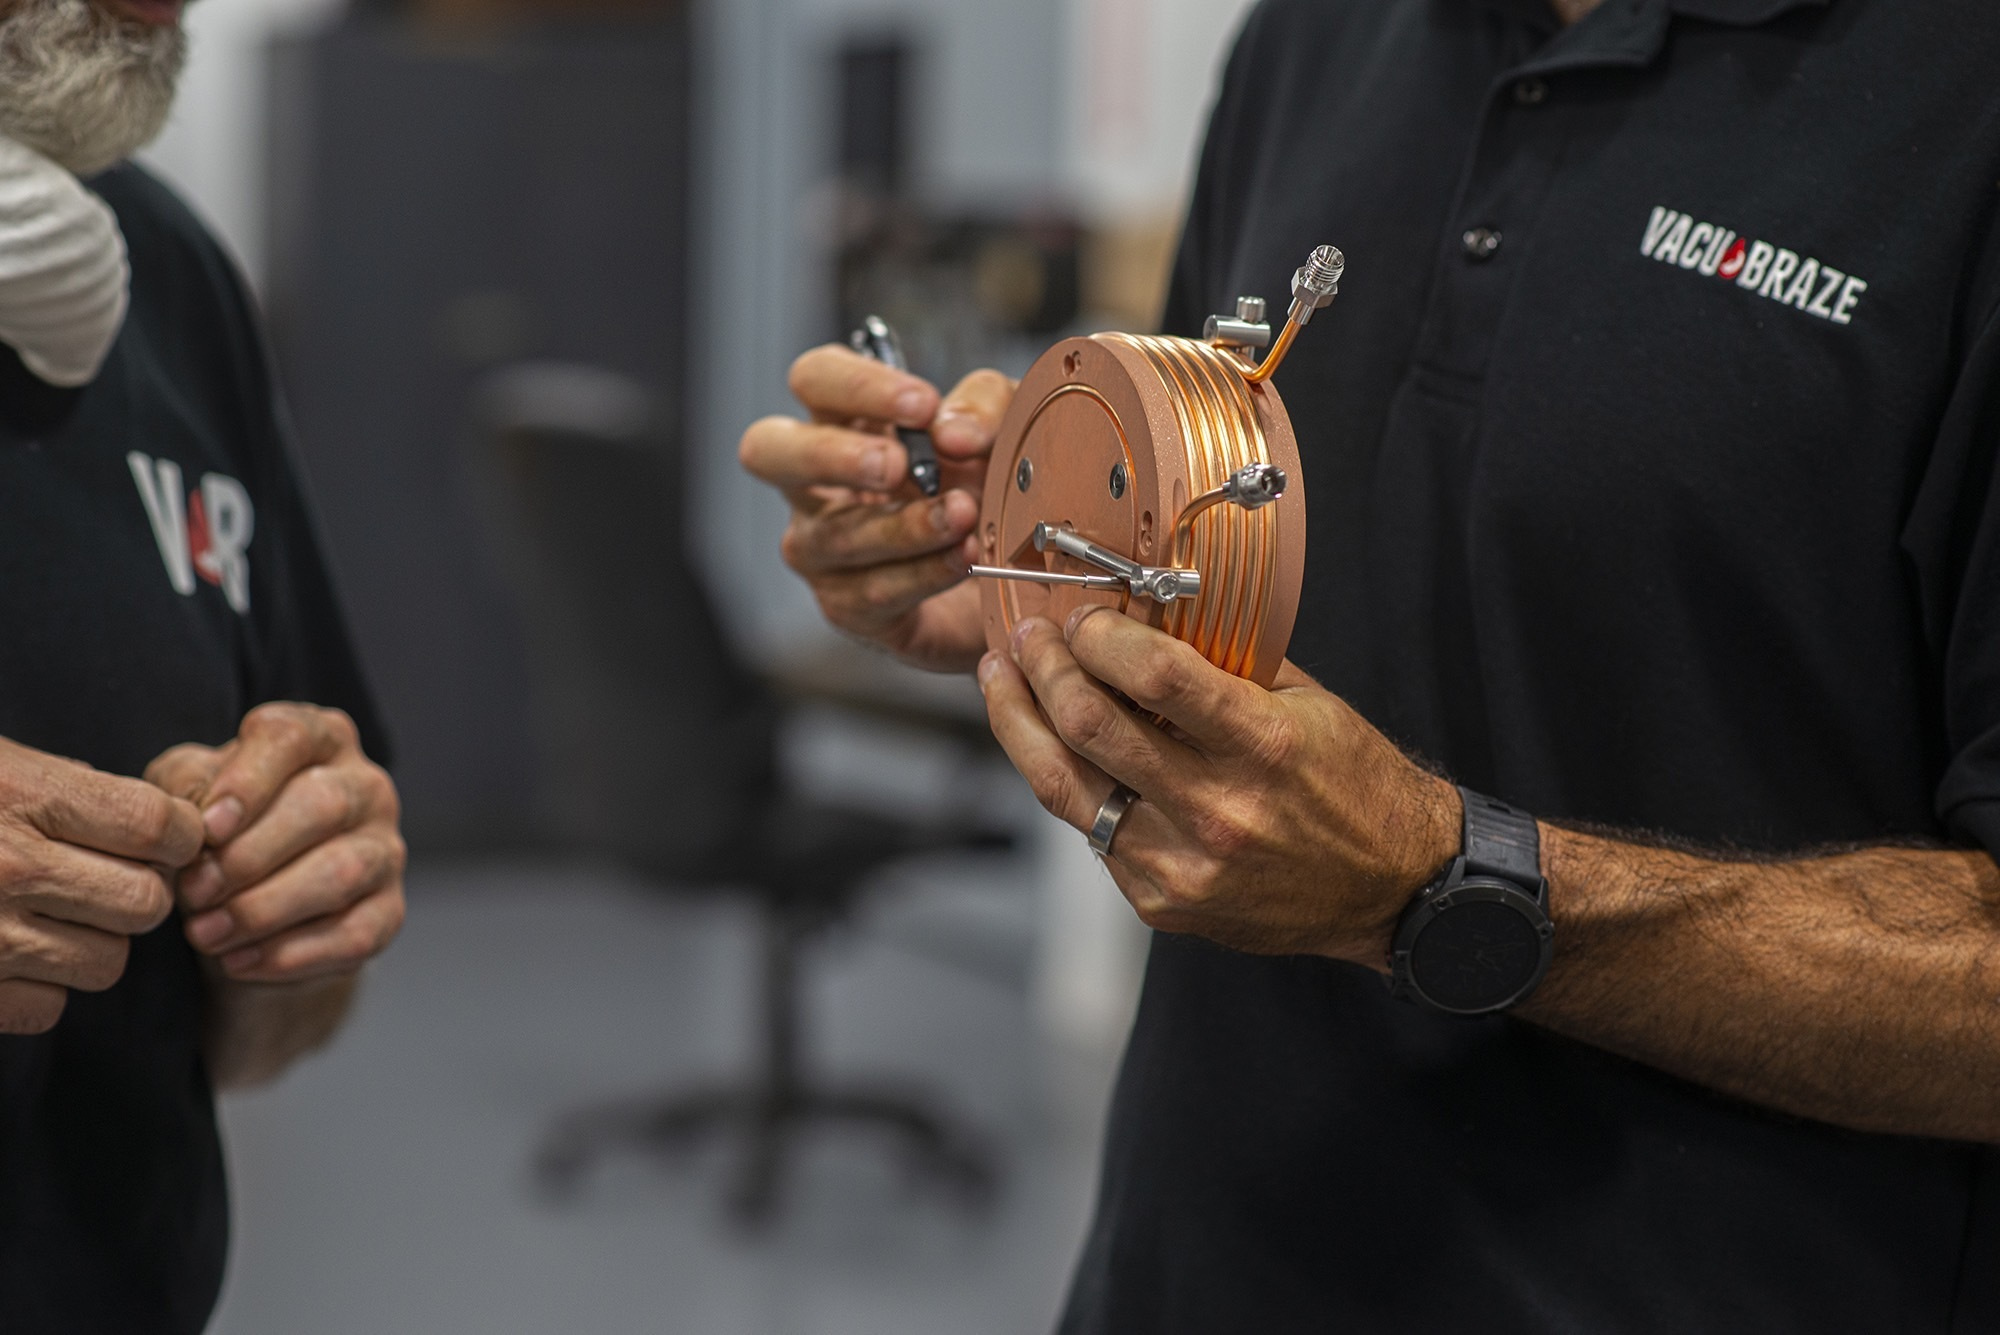 Close up of Vacu Braze team member reviewing parts